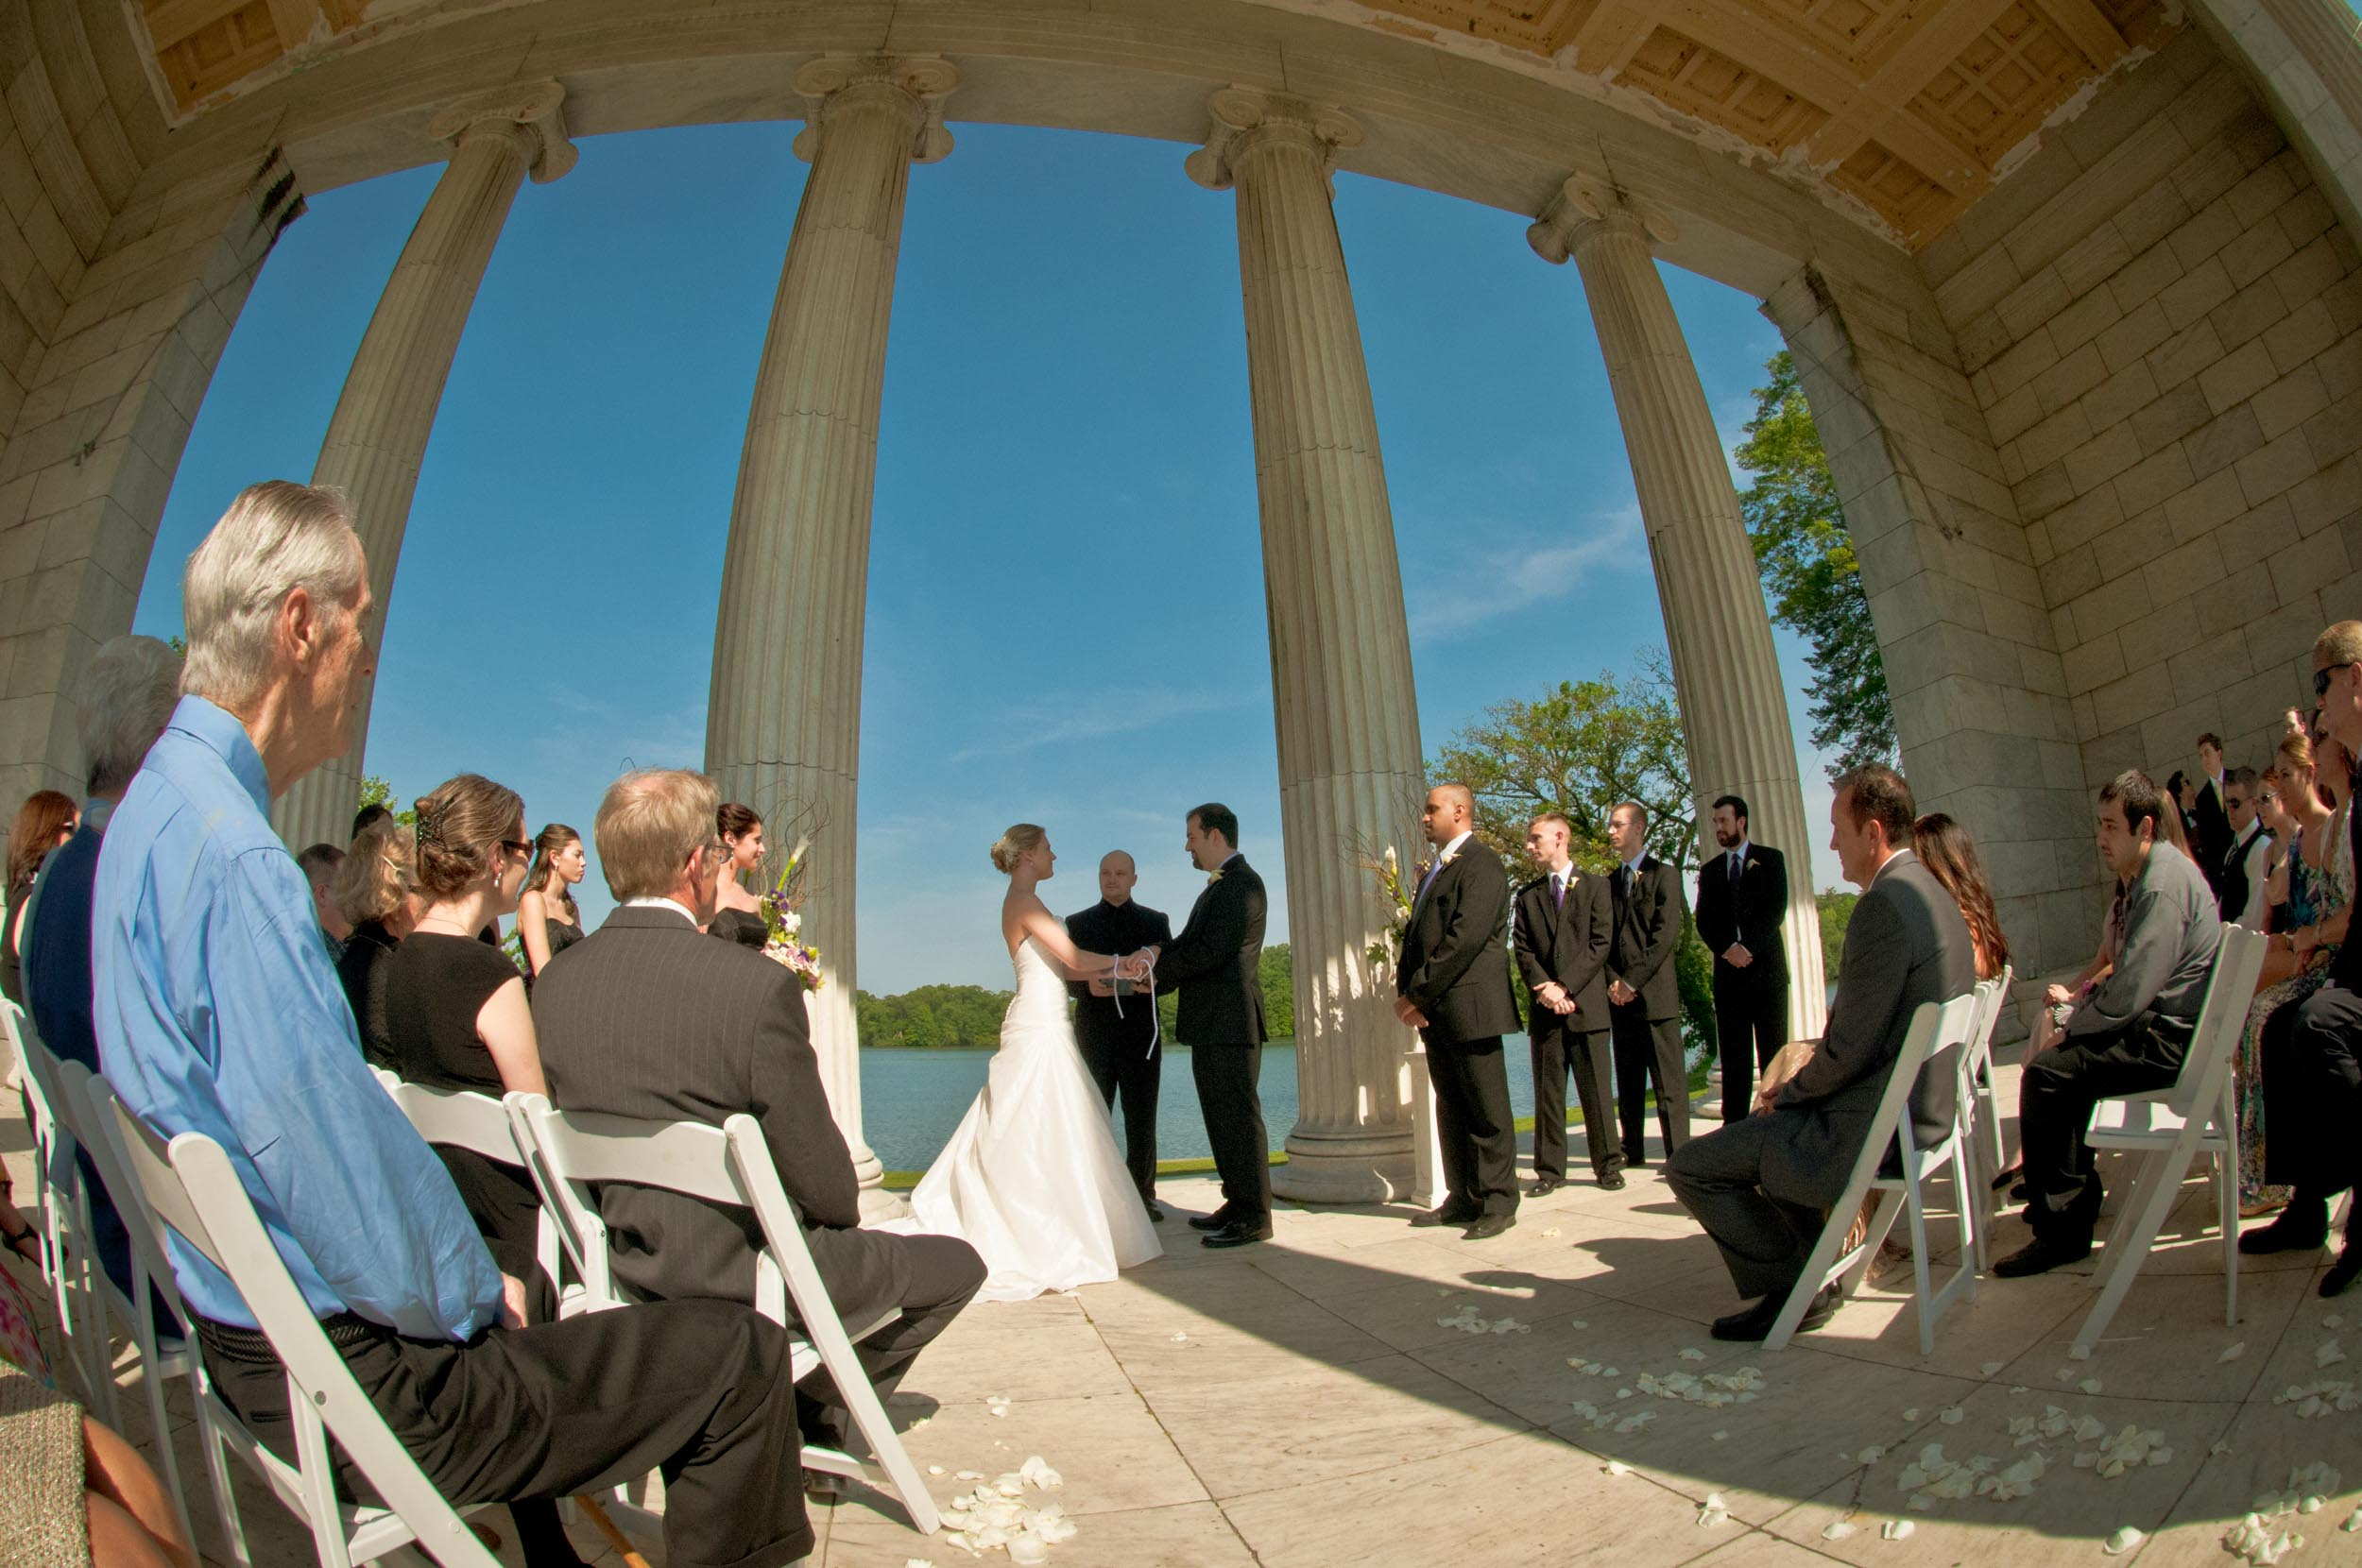 Wedding65Roger_williams_park_wedding-2.jpg